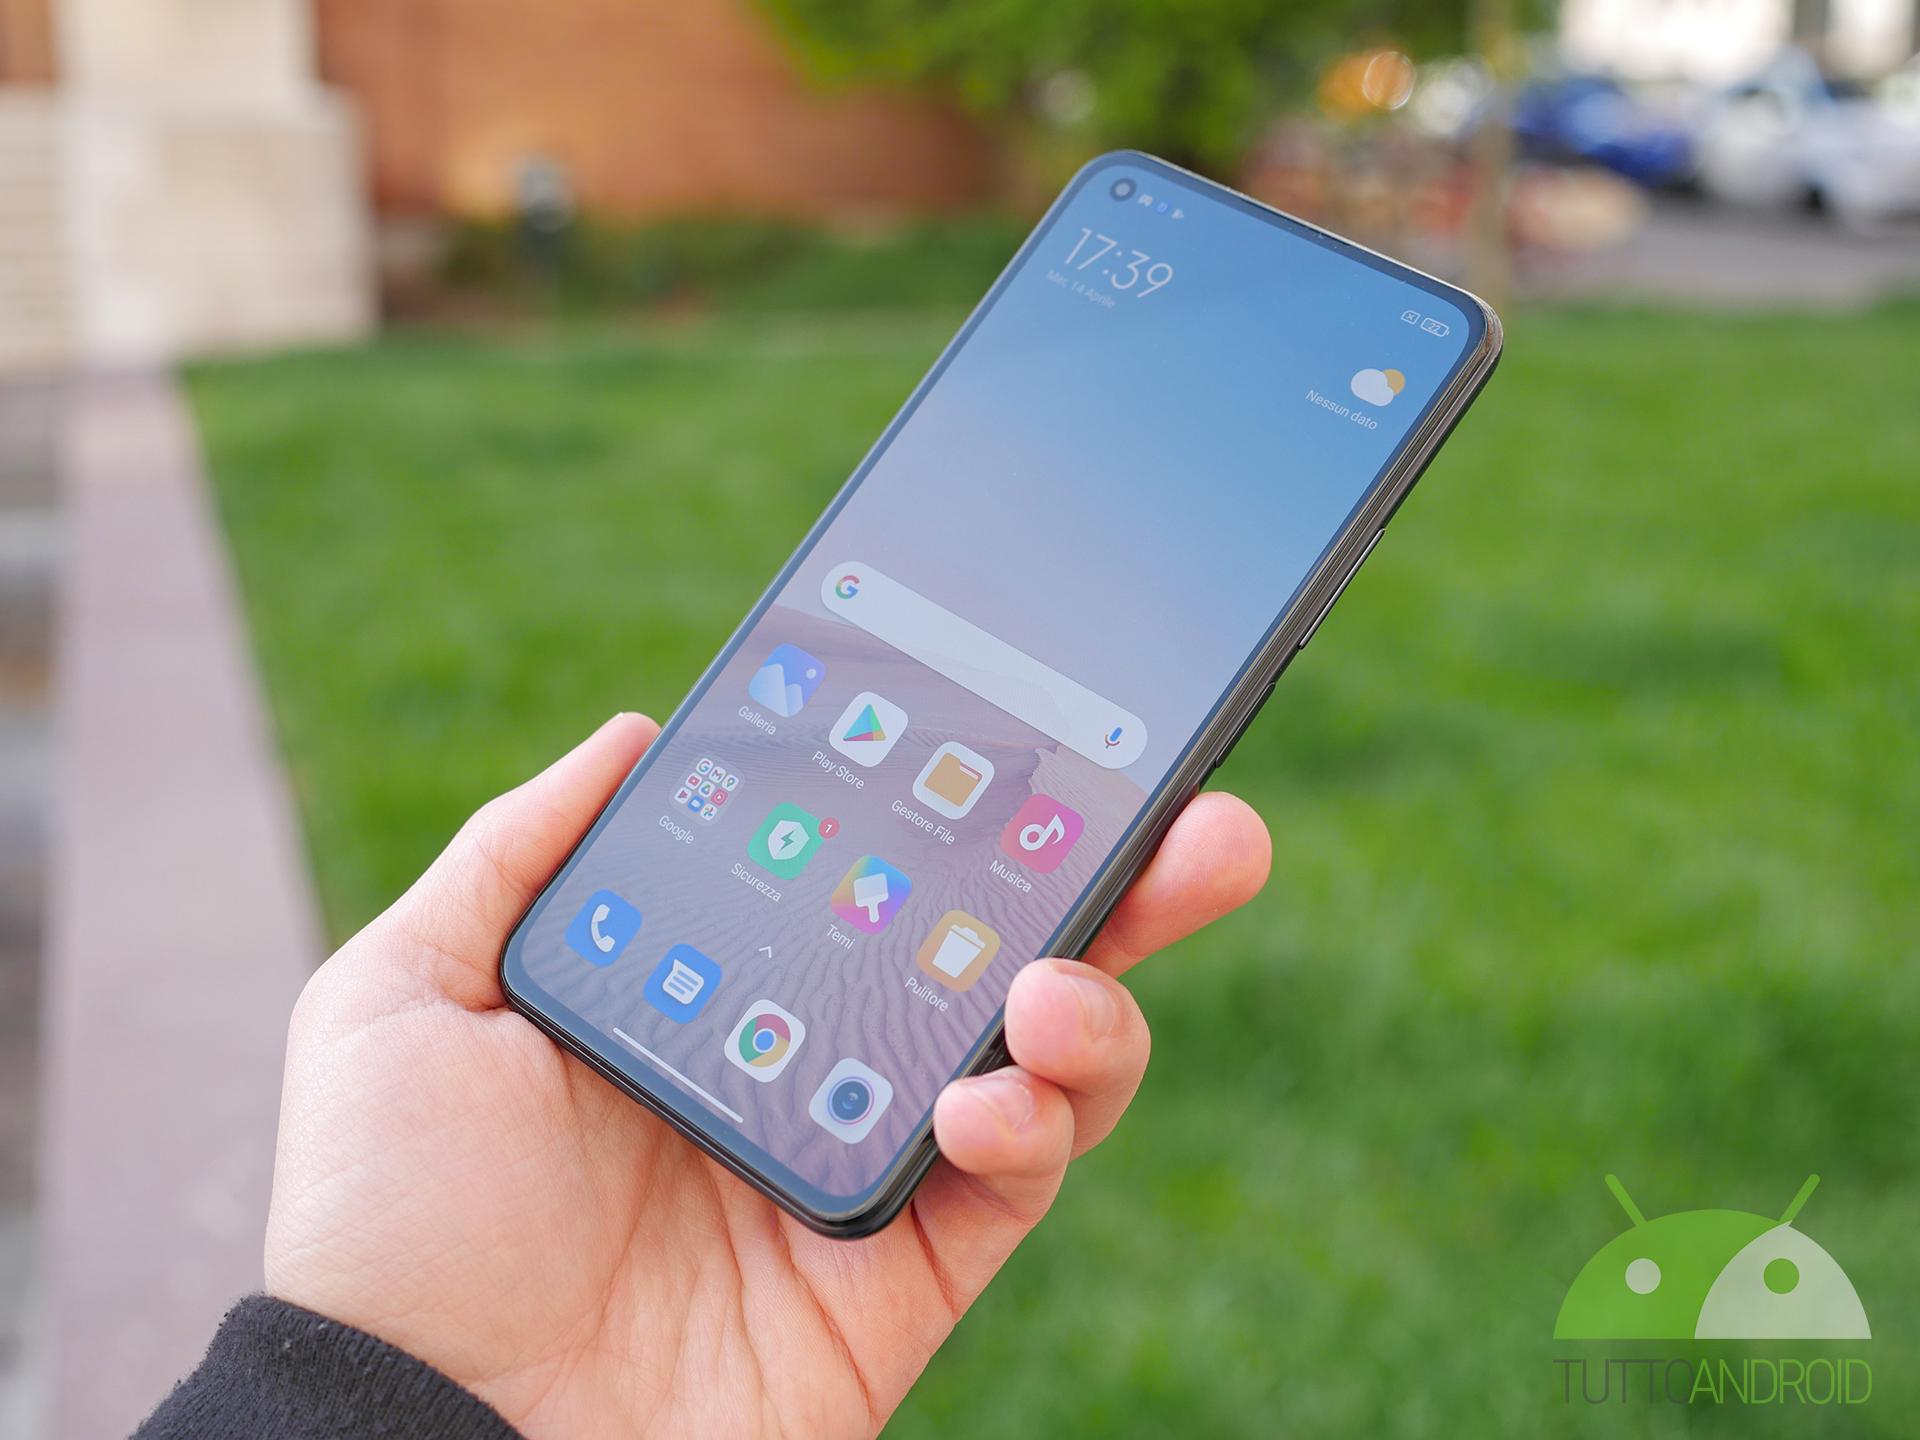 Xiaomi inarrestabile: è suo il Q2 per vendite di smartphone in UE